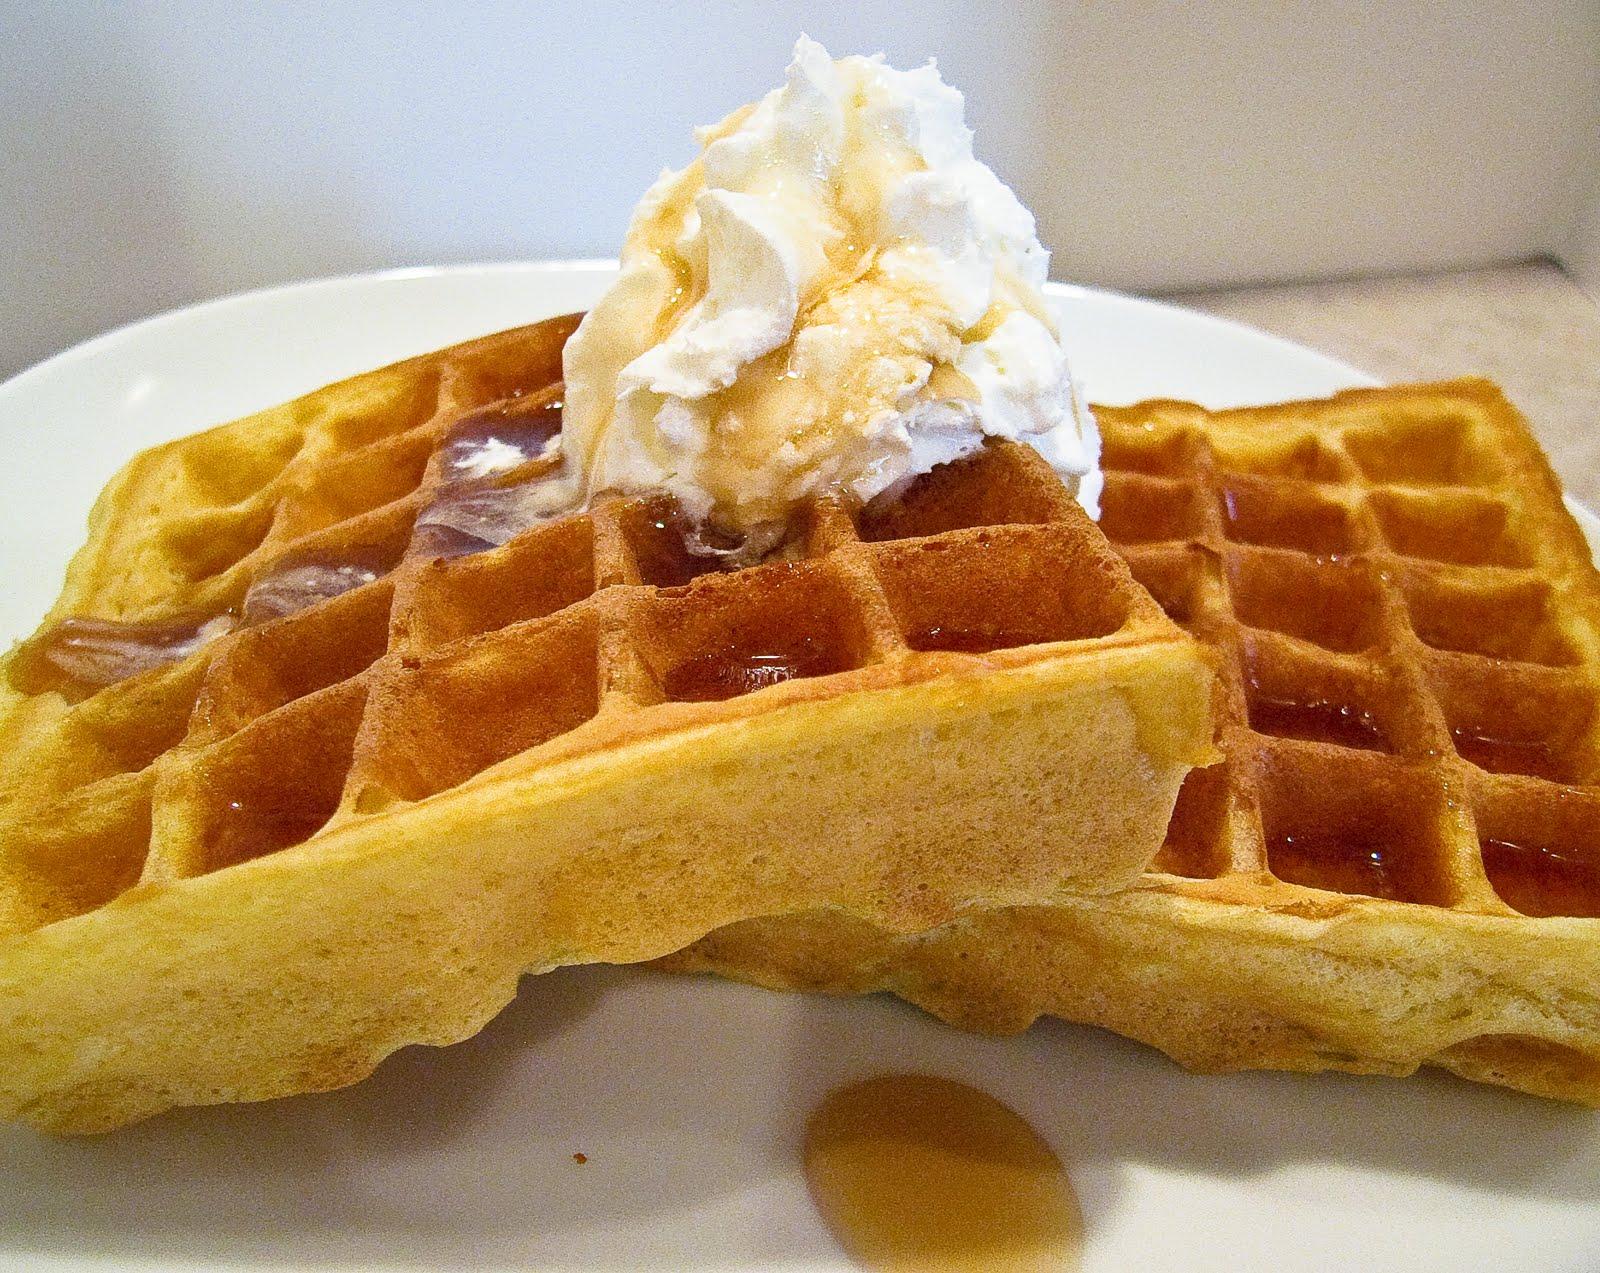 ... waffles best buttermilk waffles recipe buttermilk waffles recipe make